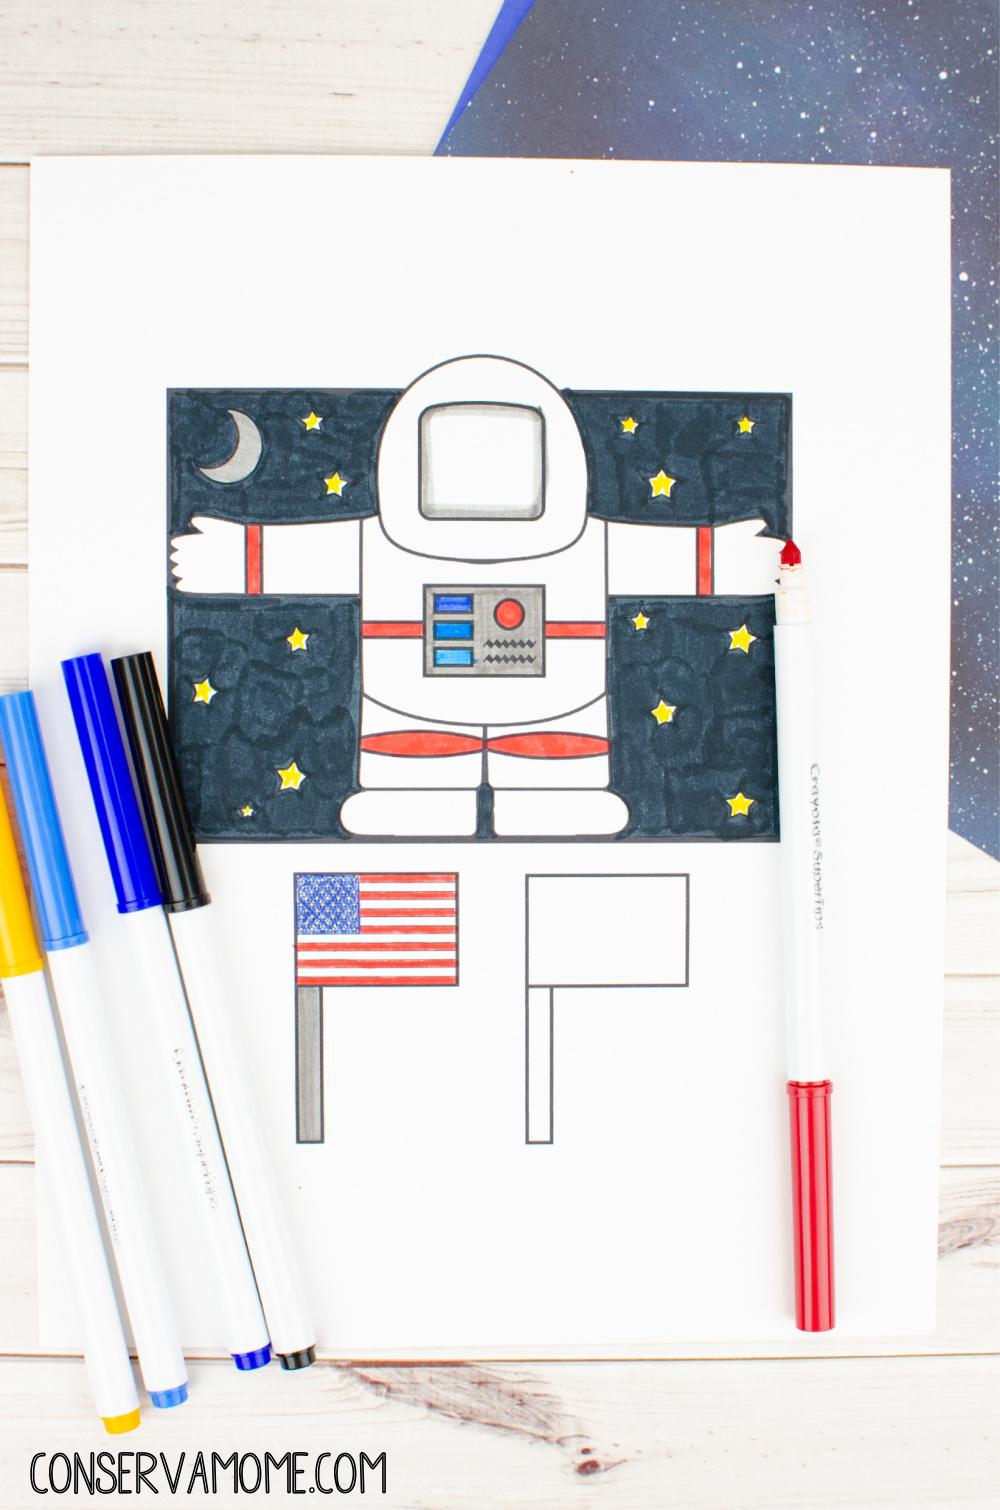 Astronaut Toilet paper roll craft